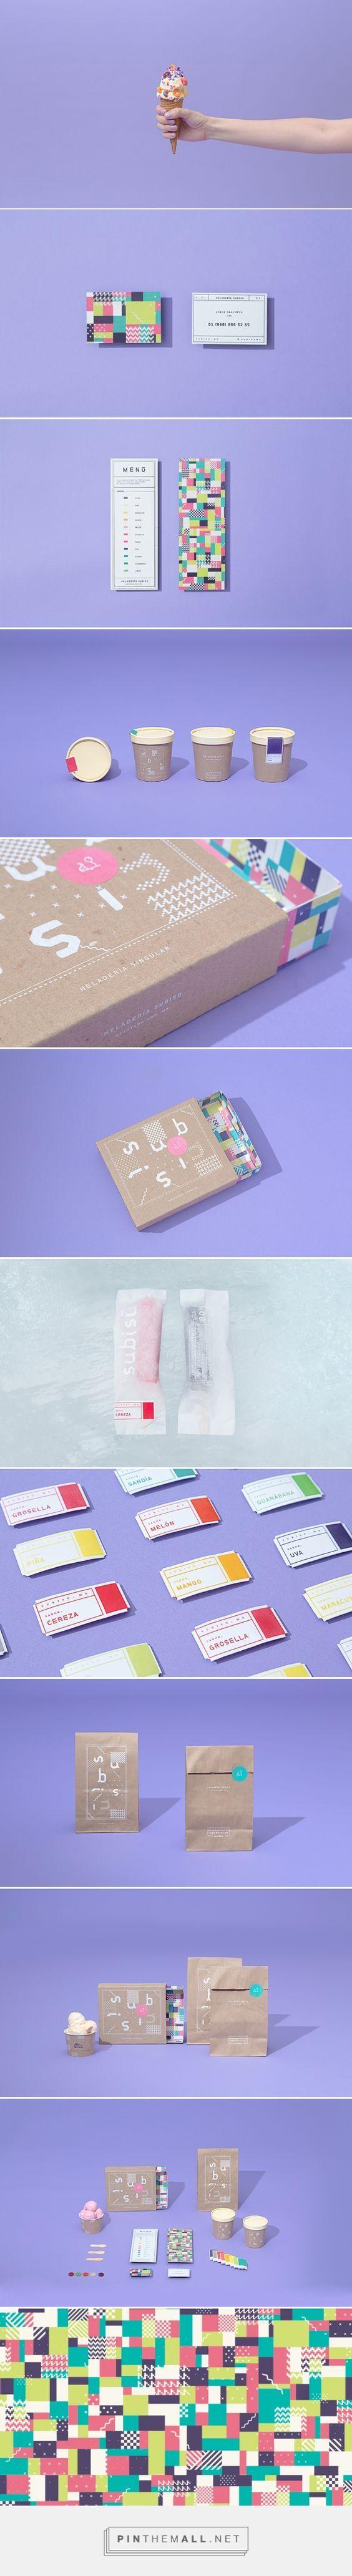 Subisú Ice Cream Branding by Futura | Fivestar Branding – Design and Branding Agency & Inspiration Gallery